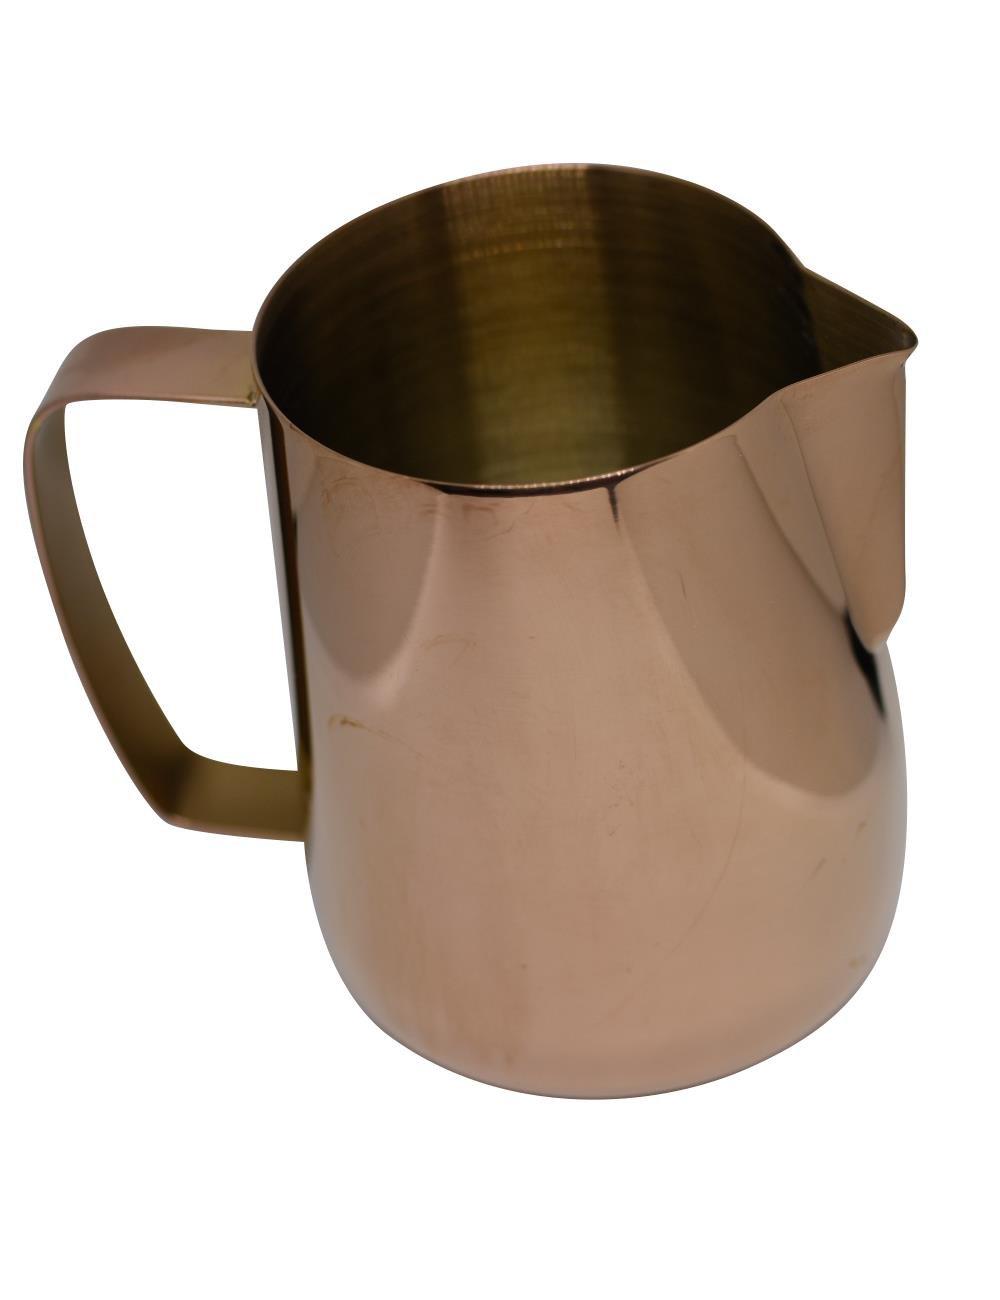 Latte Art | Stainless Steel Milk Frothing Pitcher Rose Gold 20 oz Titanium Mirror Finish